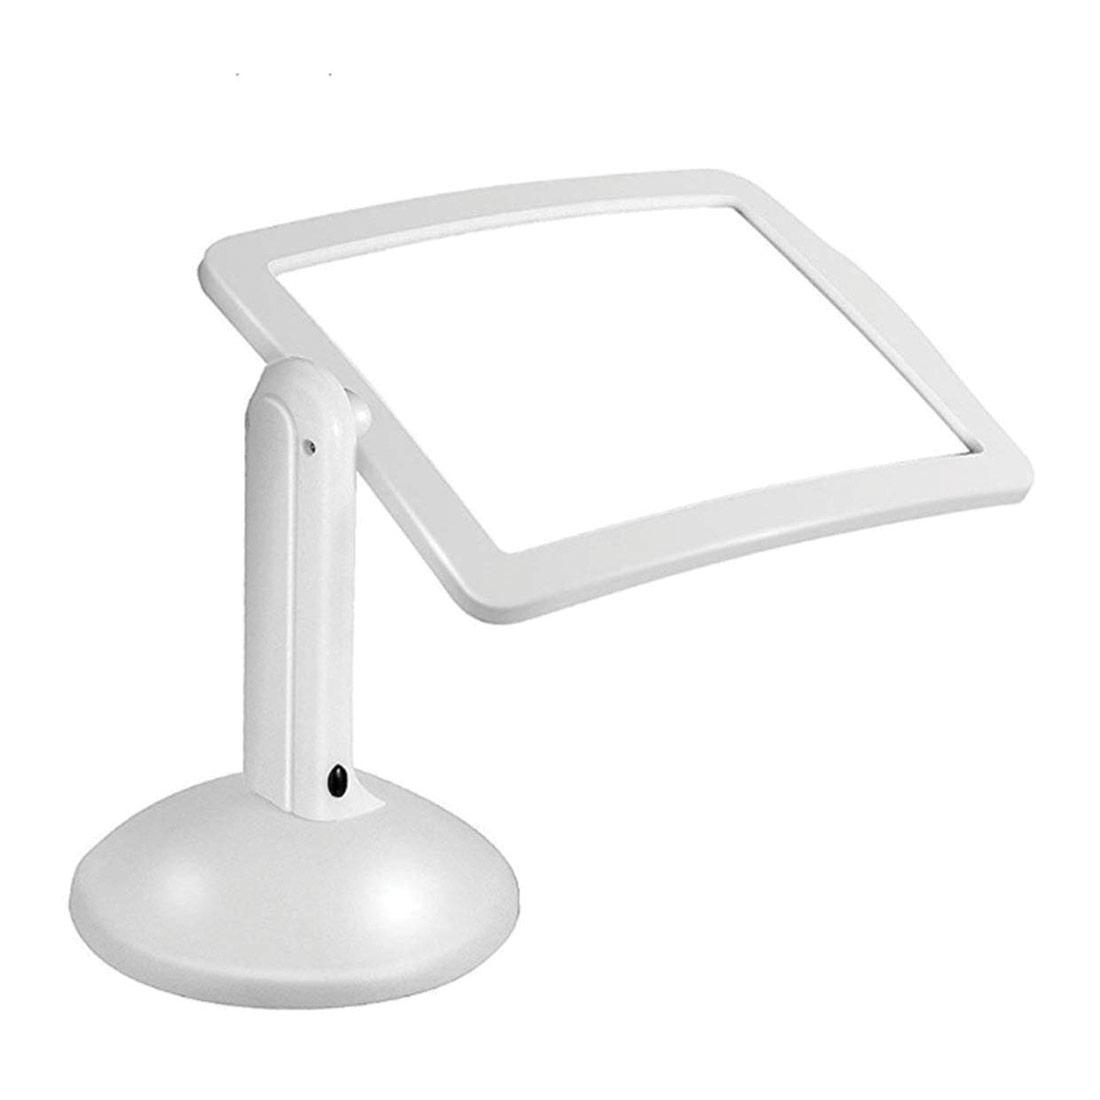 Reizen Optix Desk Magnifier 3X